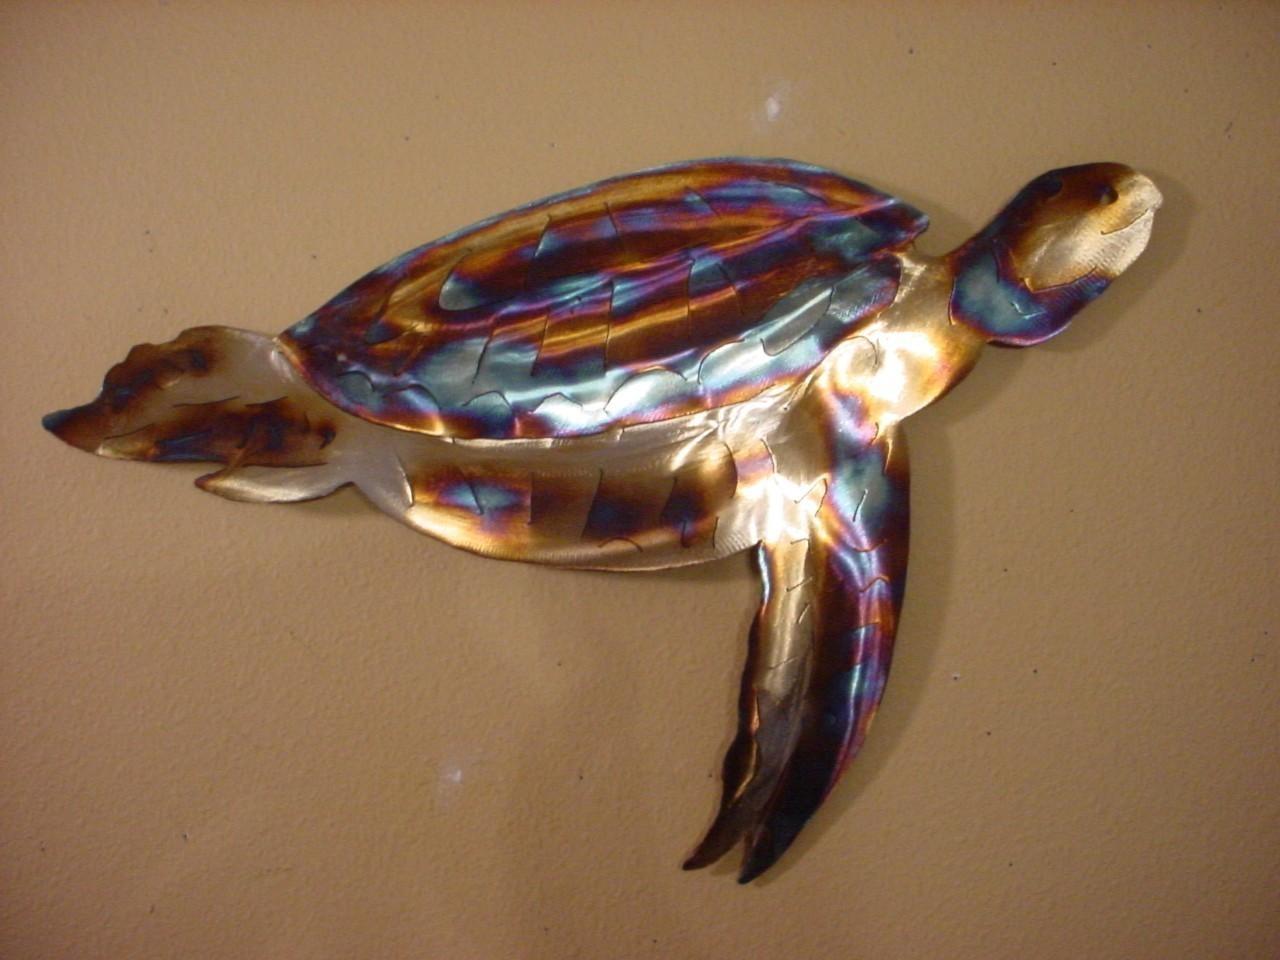 Sea Turtle Hawksbill Green Loggerhead Turtles Steel Ocean Regarding Sea Turtle Metal Wall Art (Image 8 of 20)